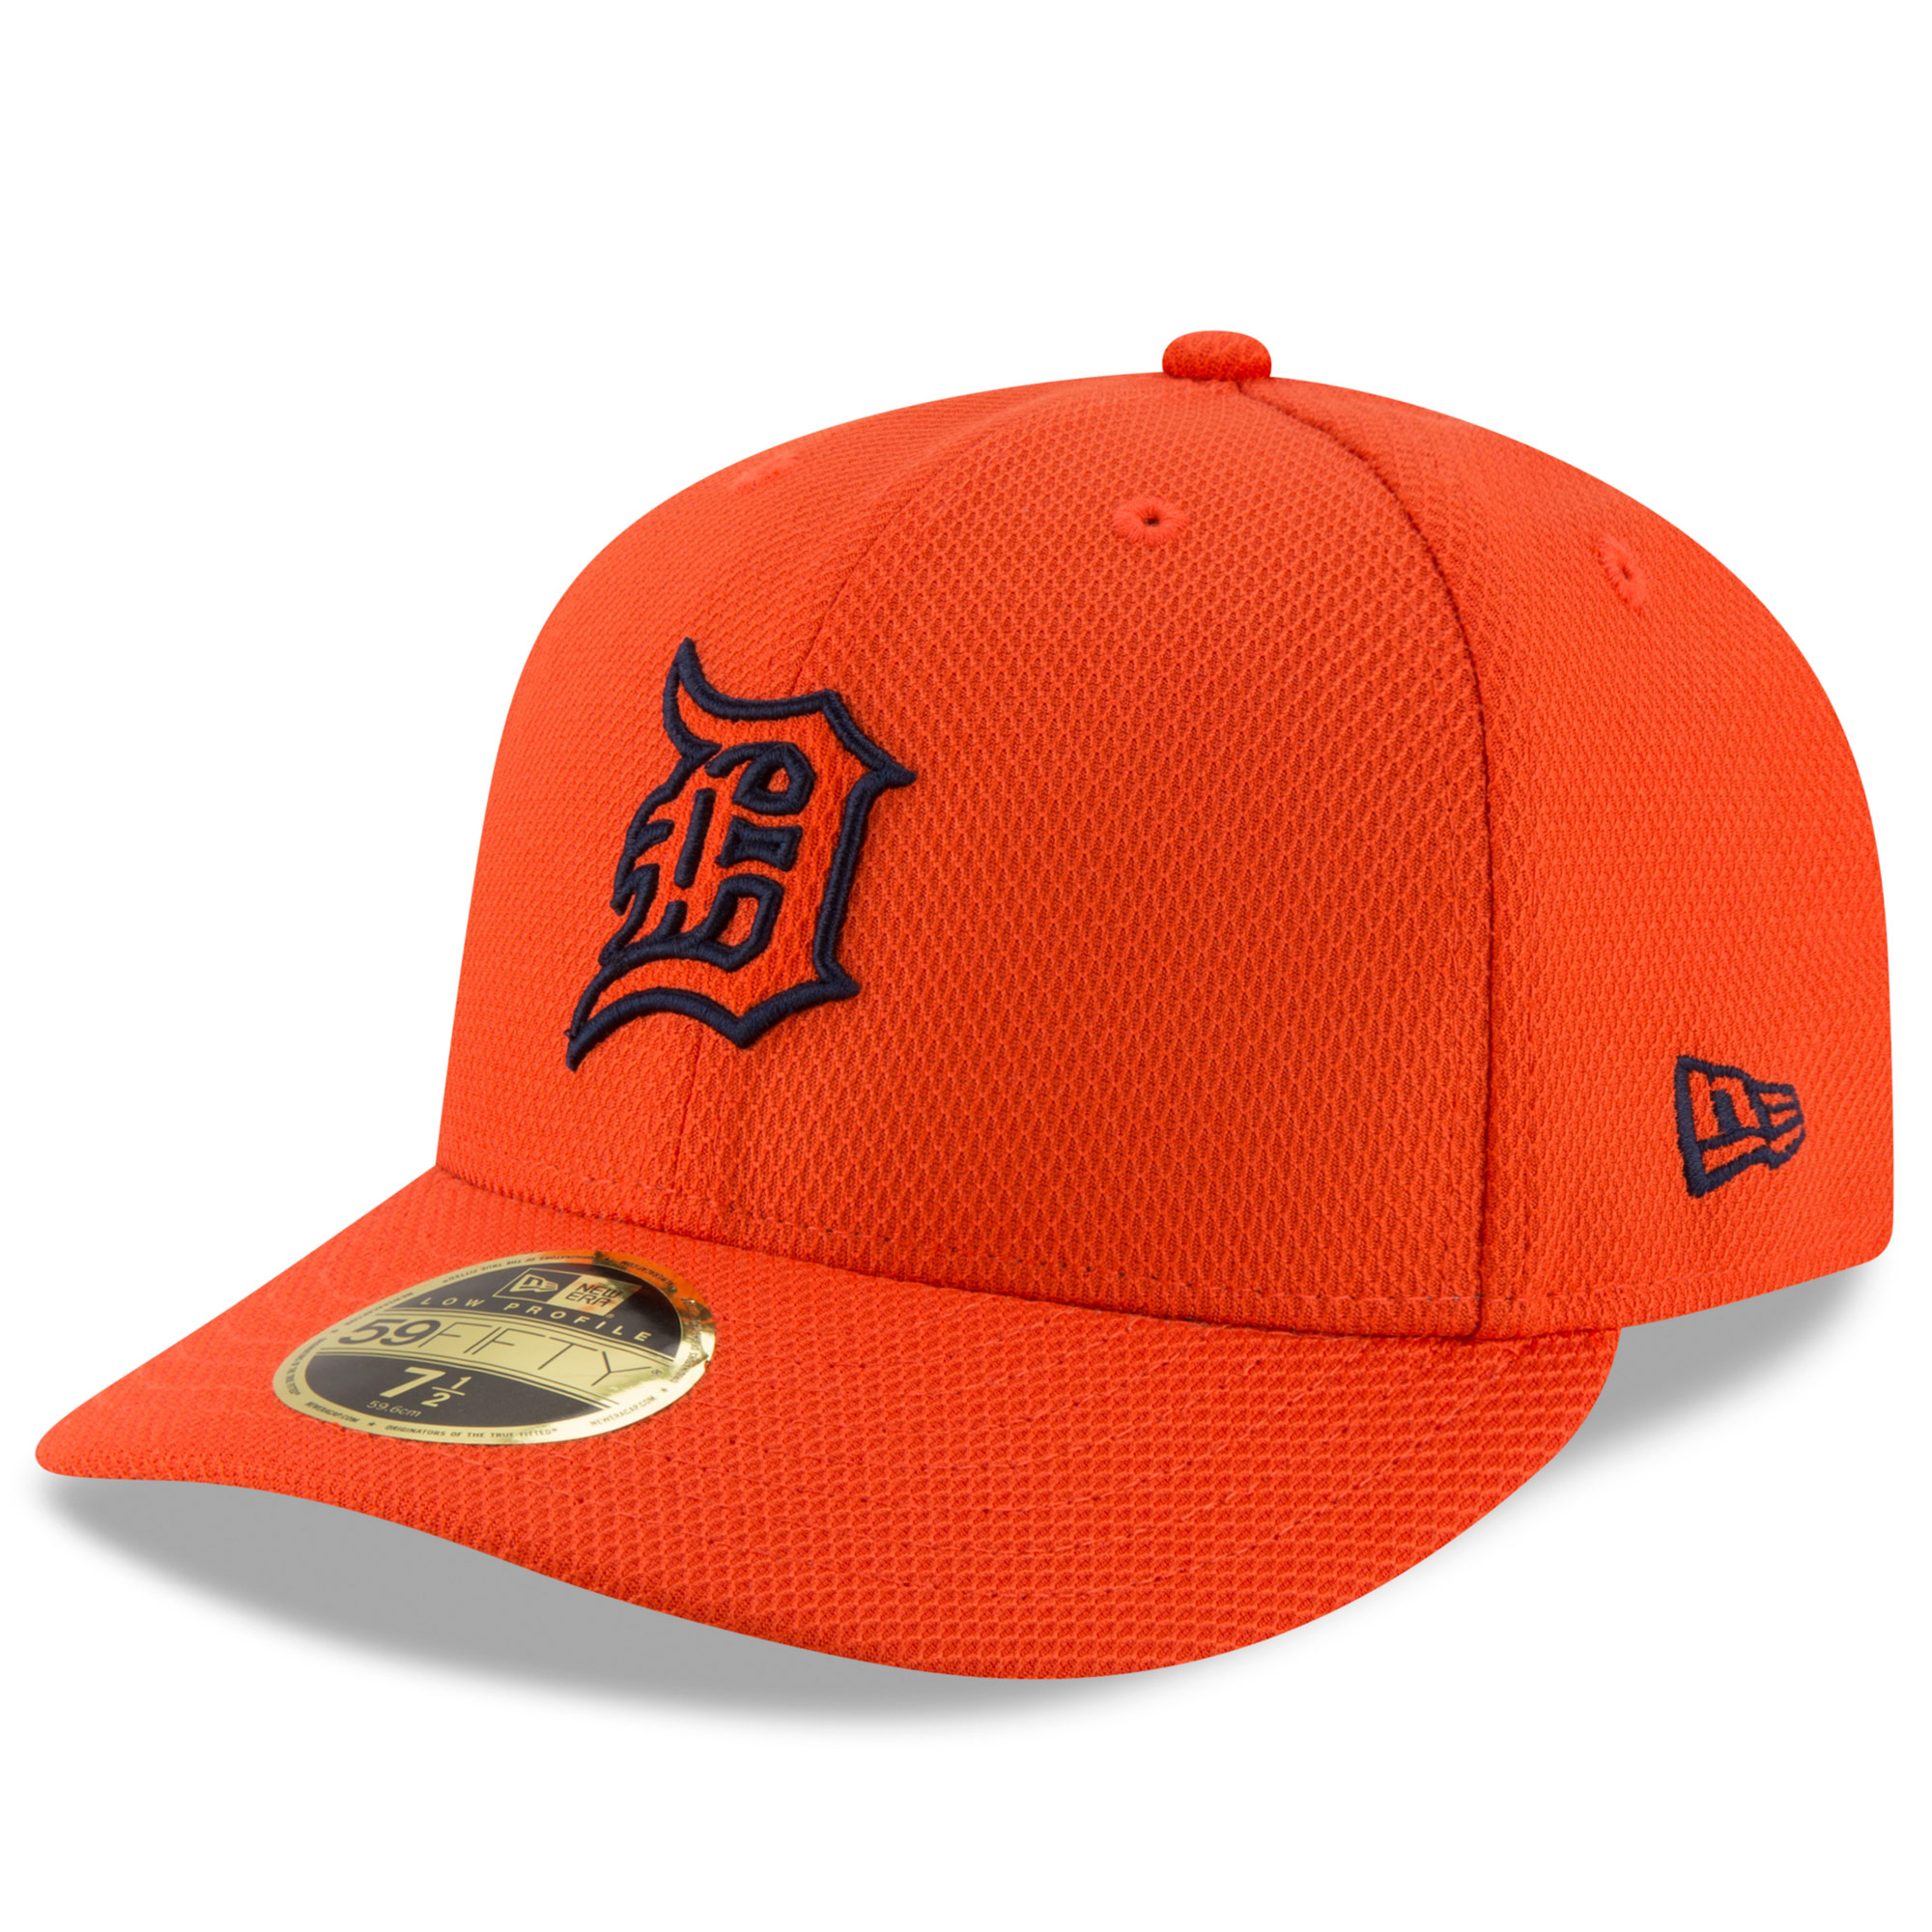 Detroit Tigers New Era Diamond Era 59FIFTY Low Profile Fitted Hat - Orange